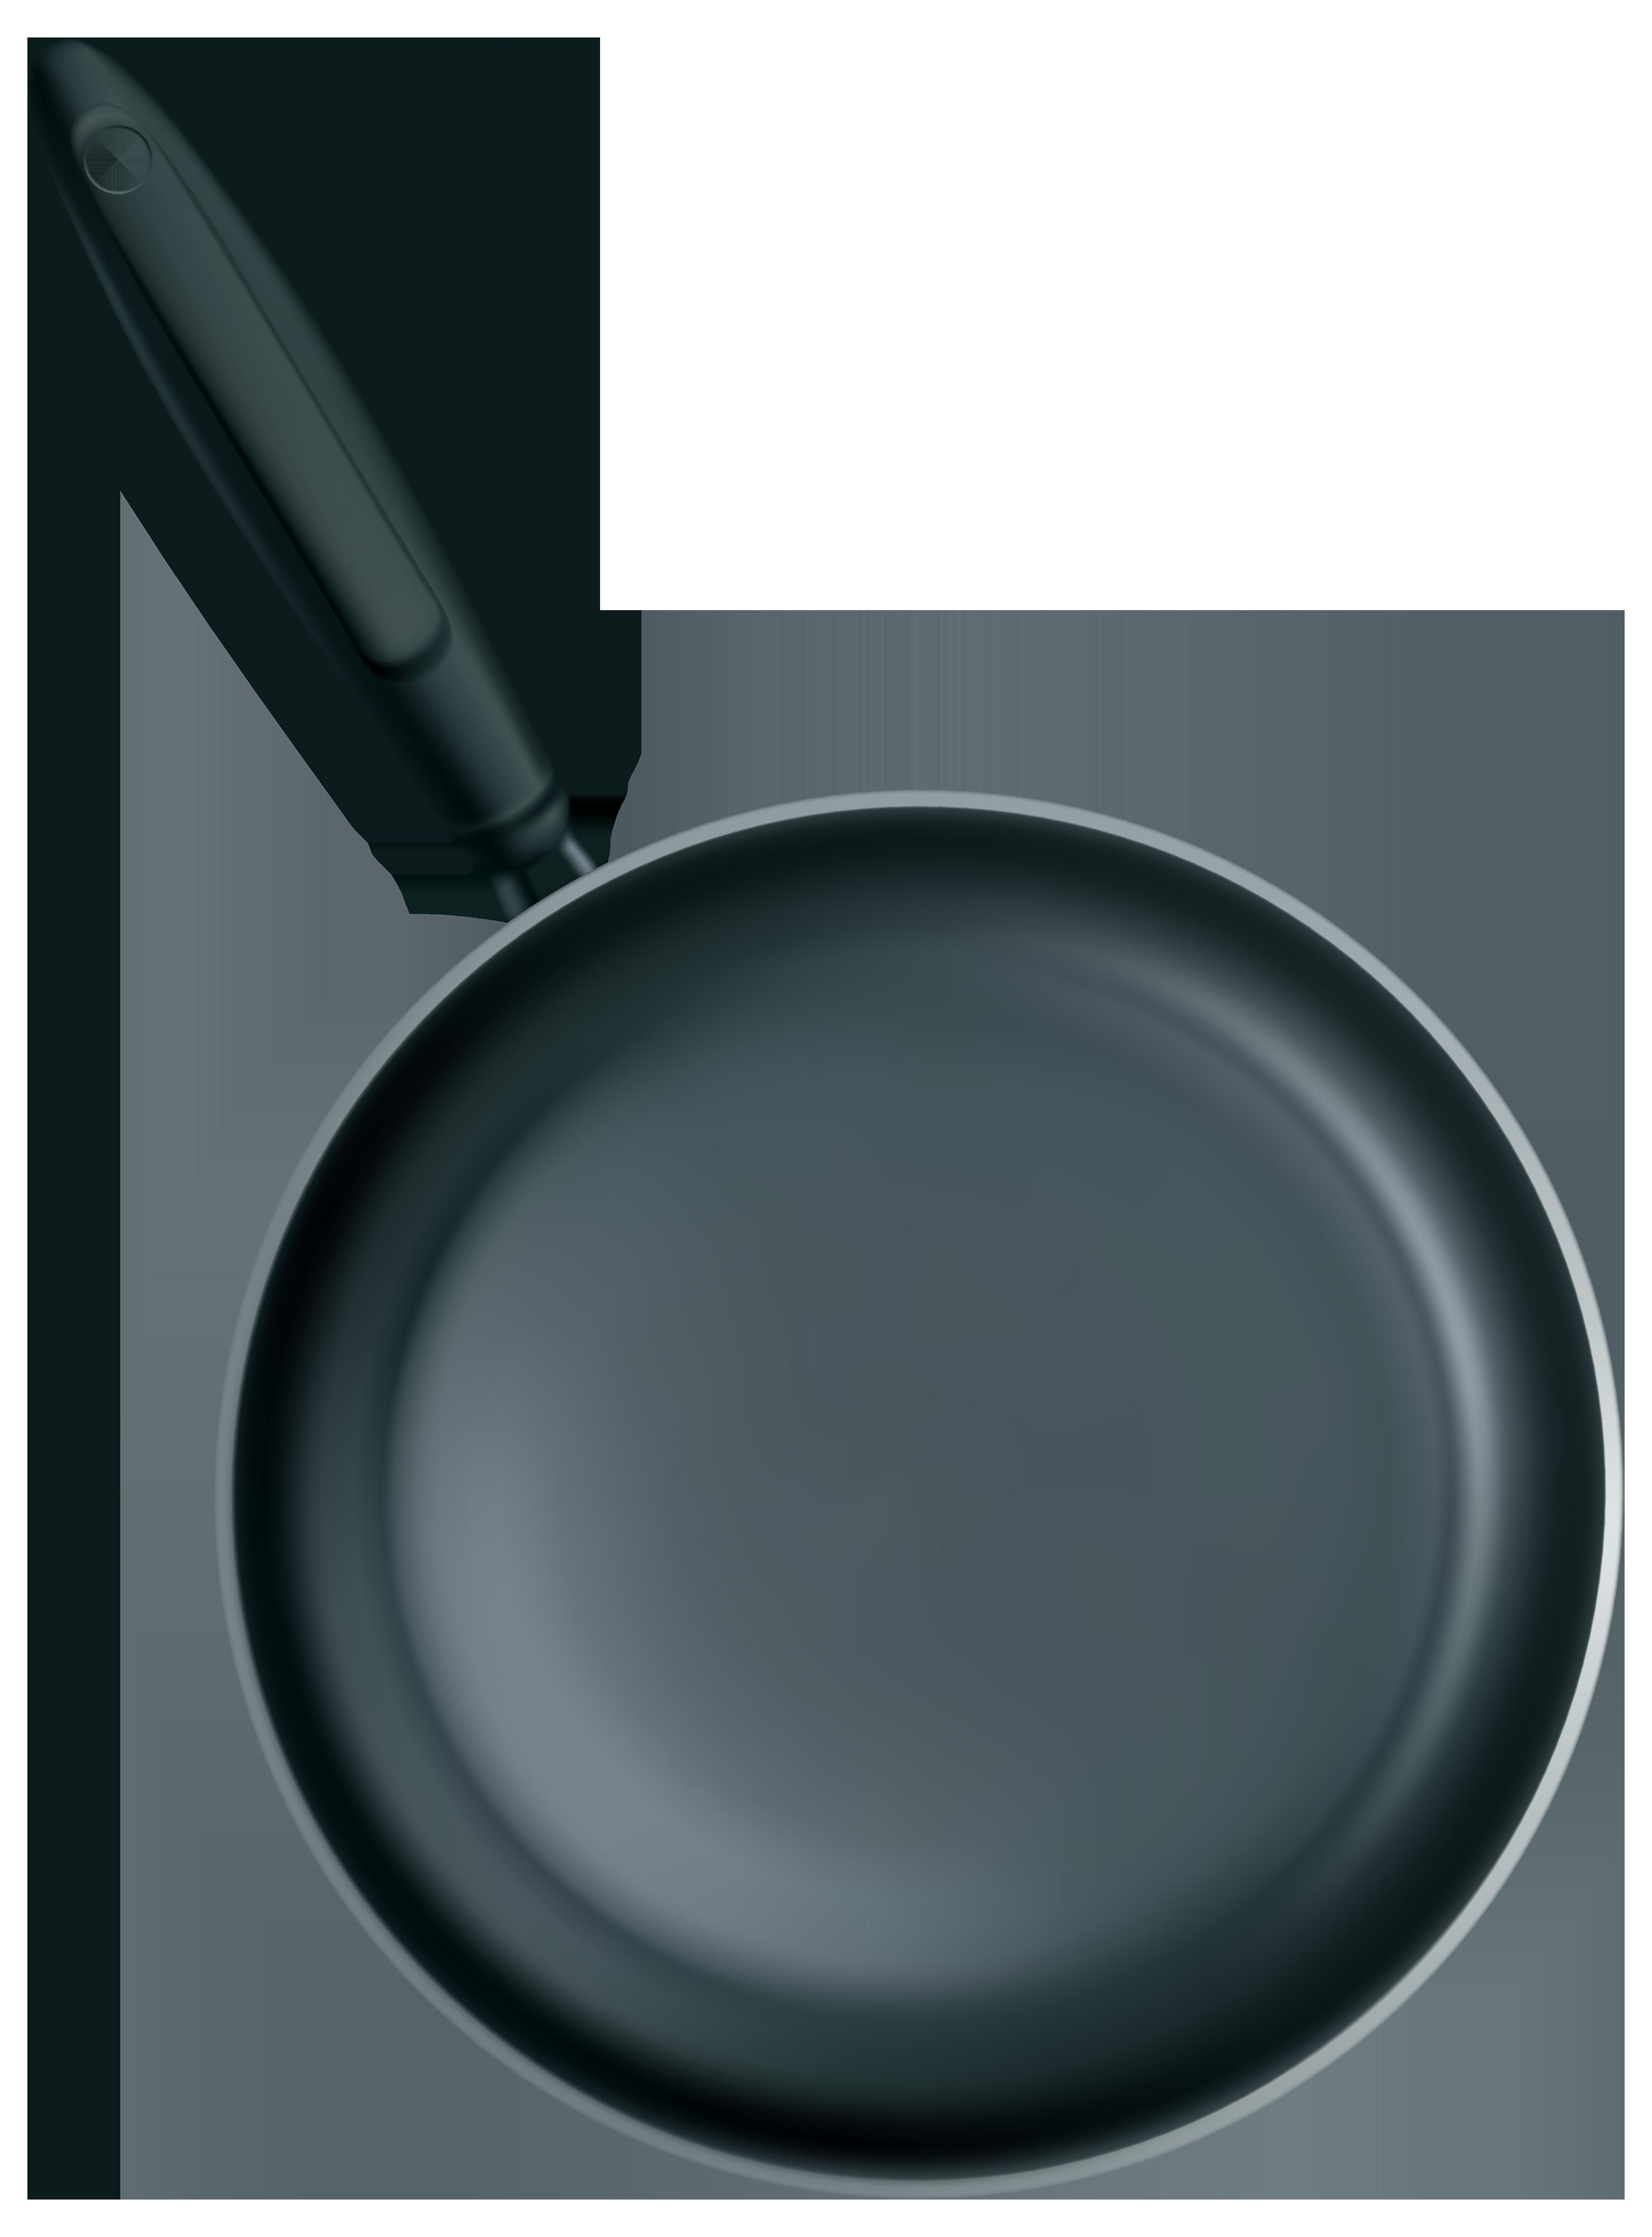 Black png best web. Fire clipart frying pan